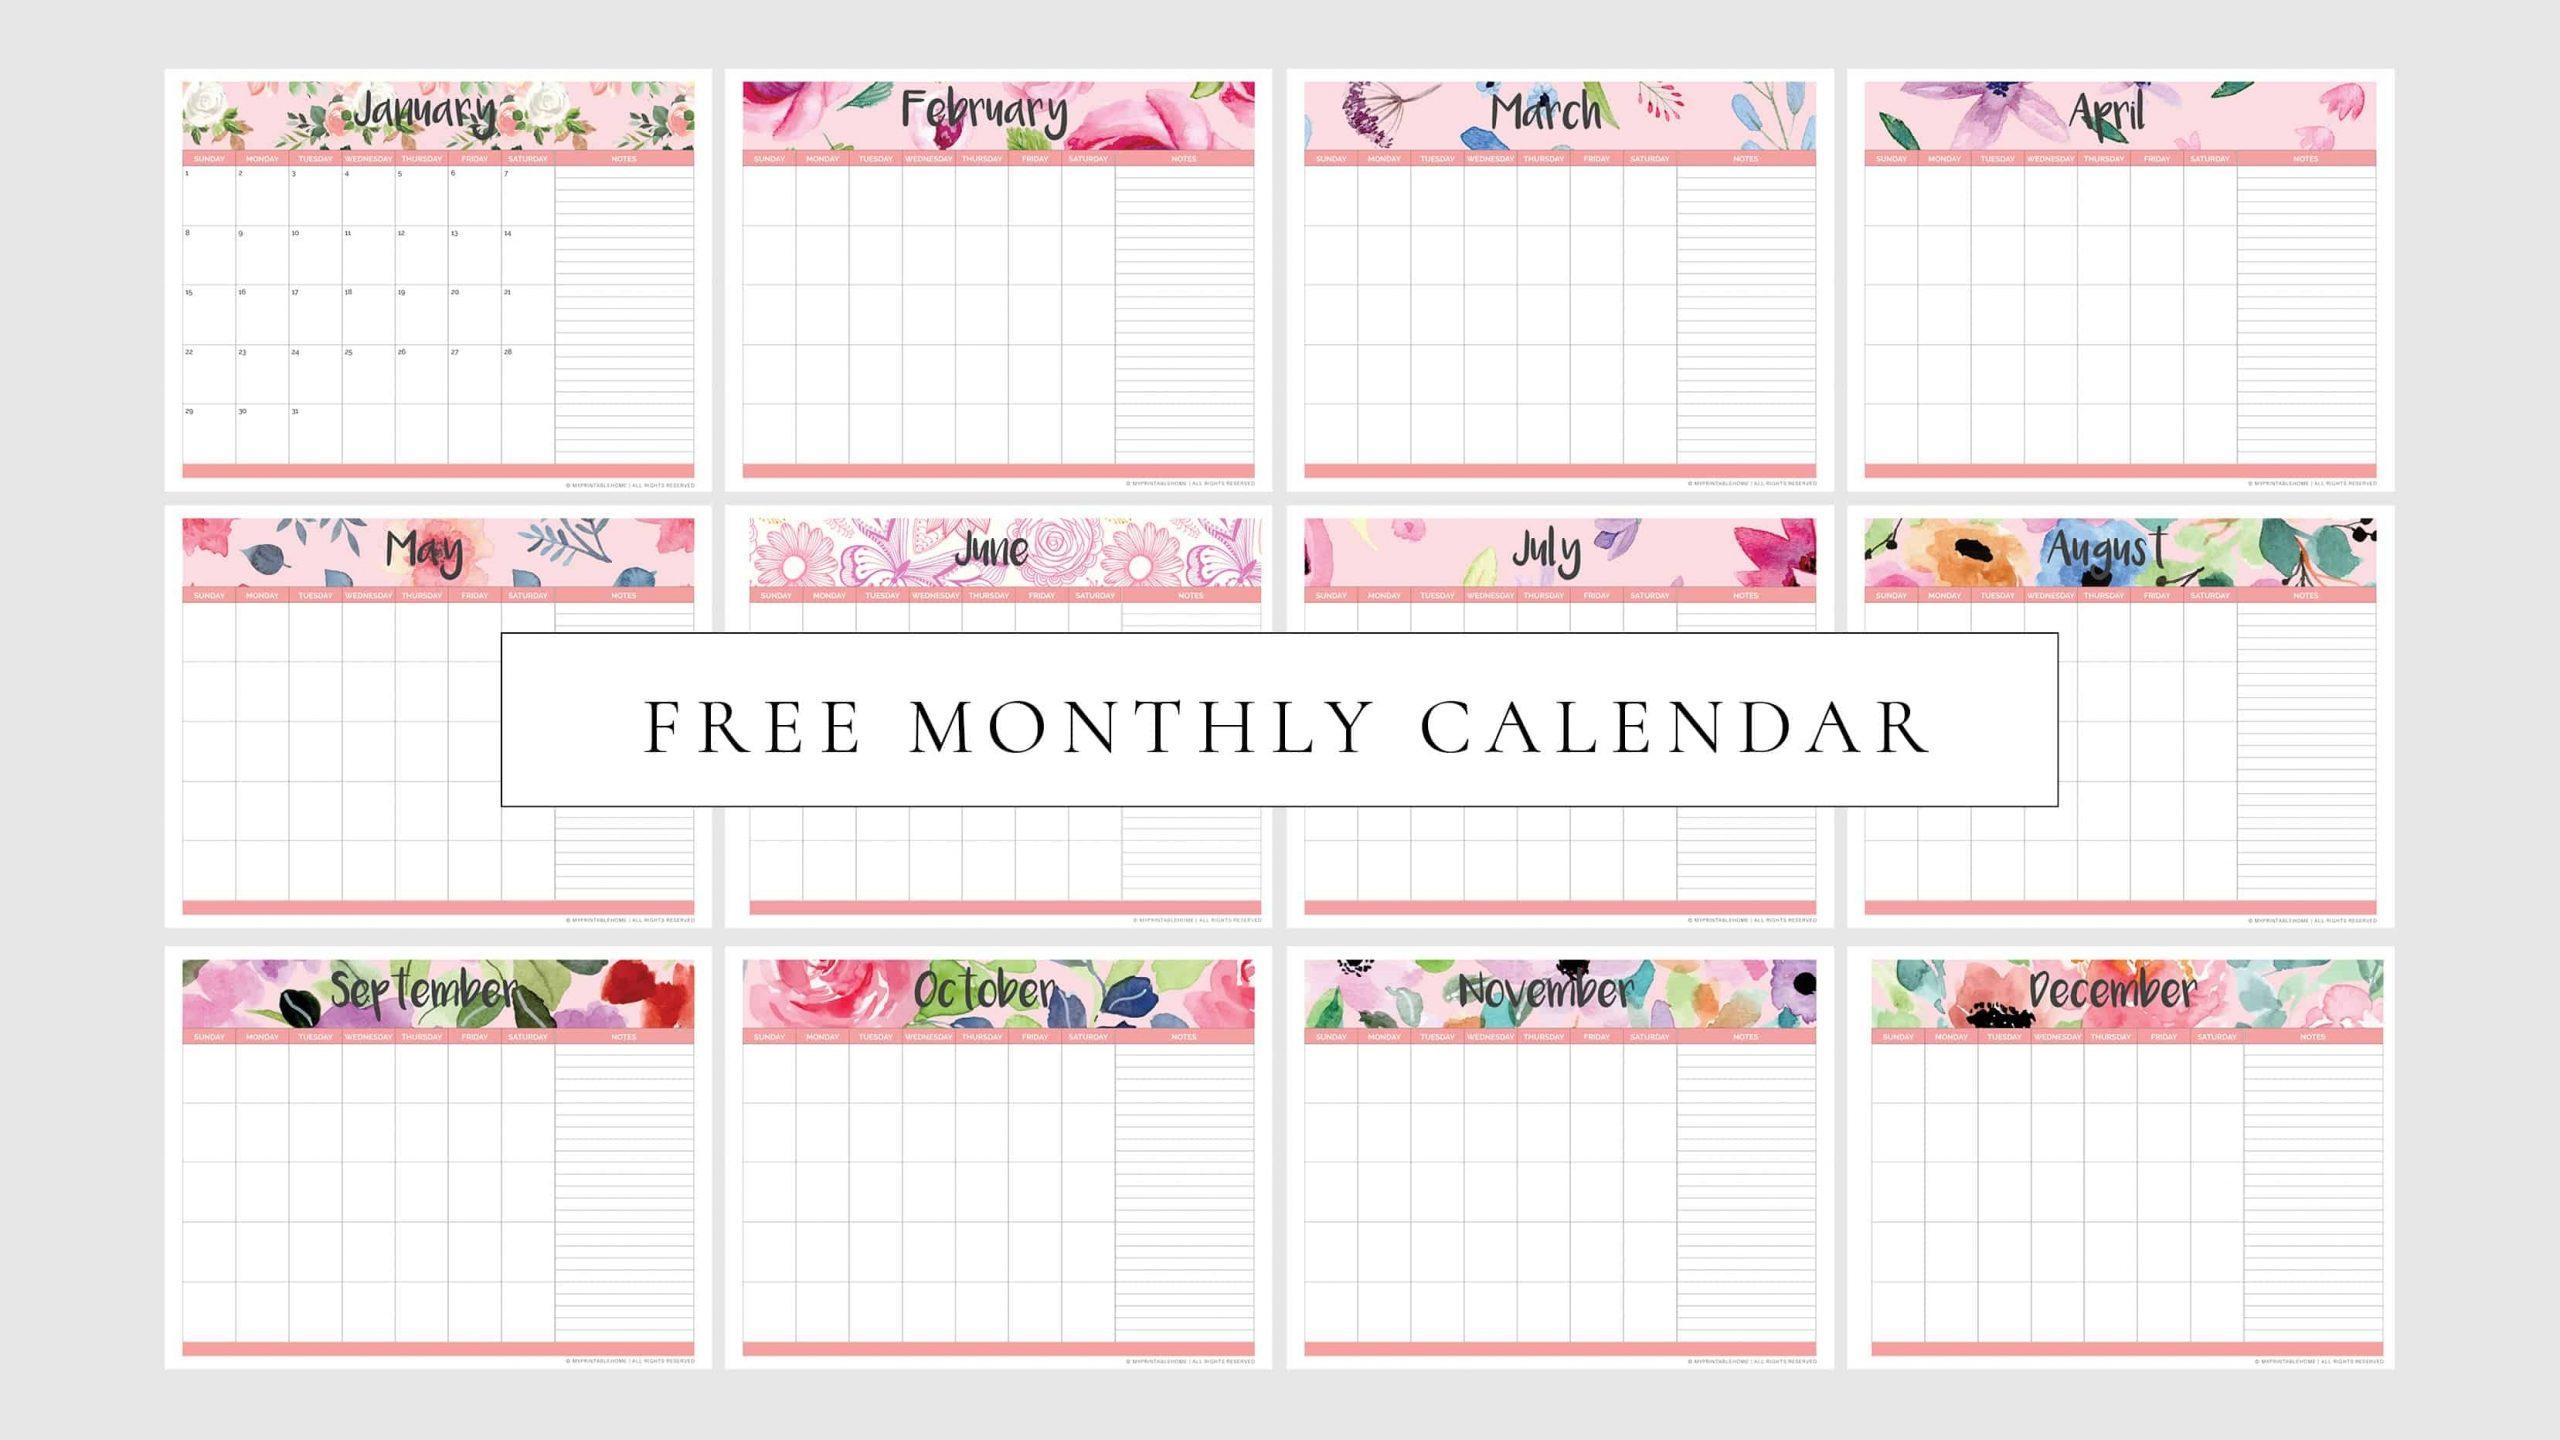 Free Printable Monthly Planner Calendar (Undated) - My with regard to Undated Free Monthly Calendar Printable Free